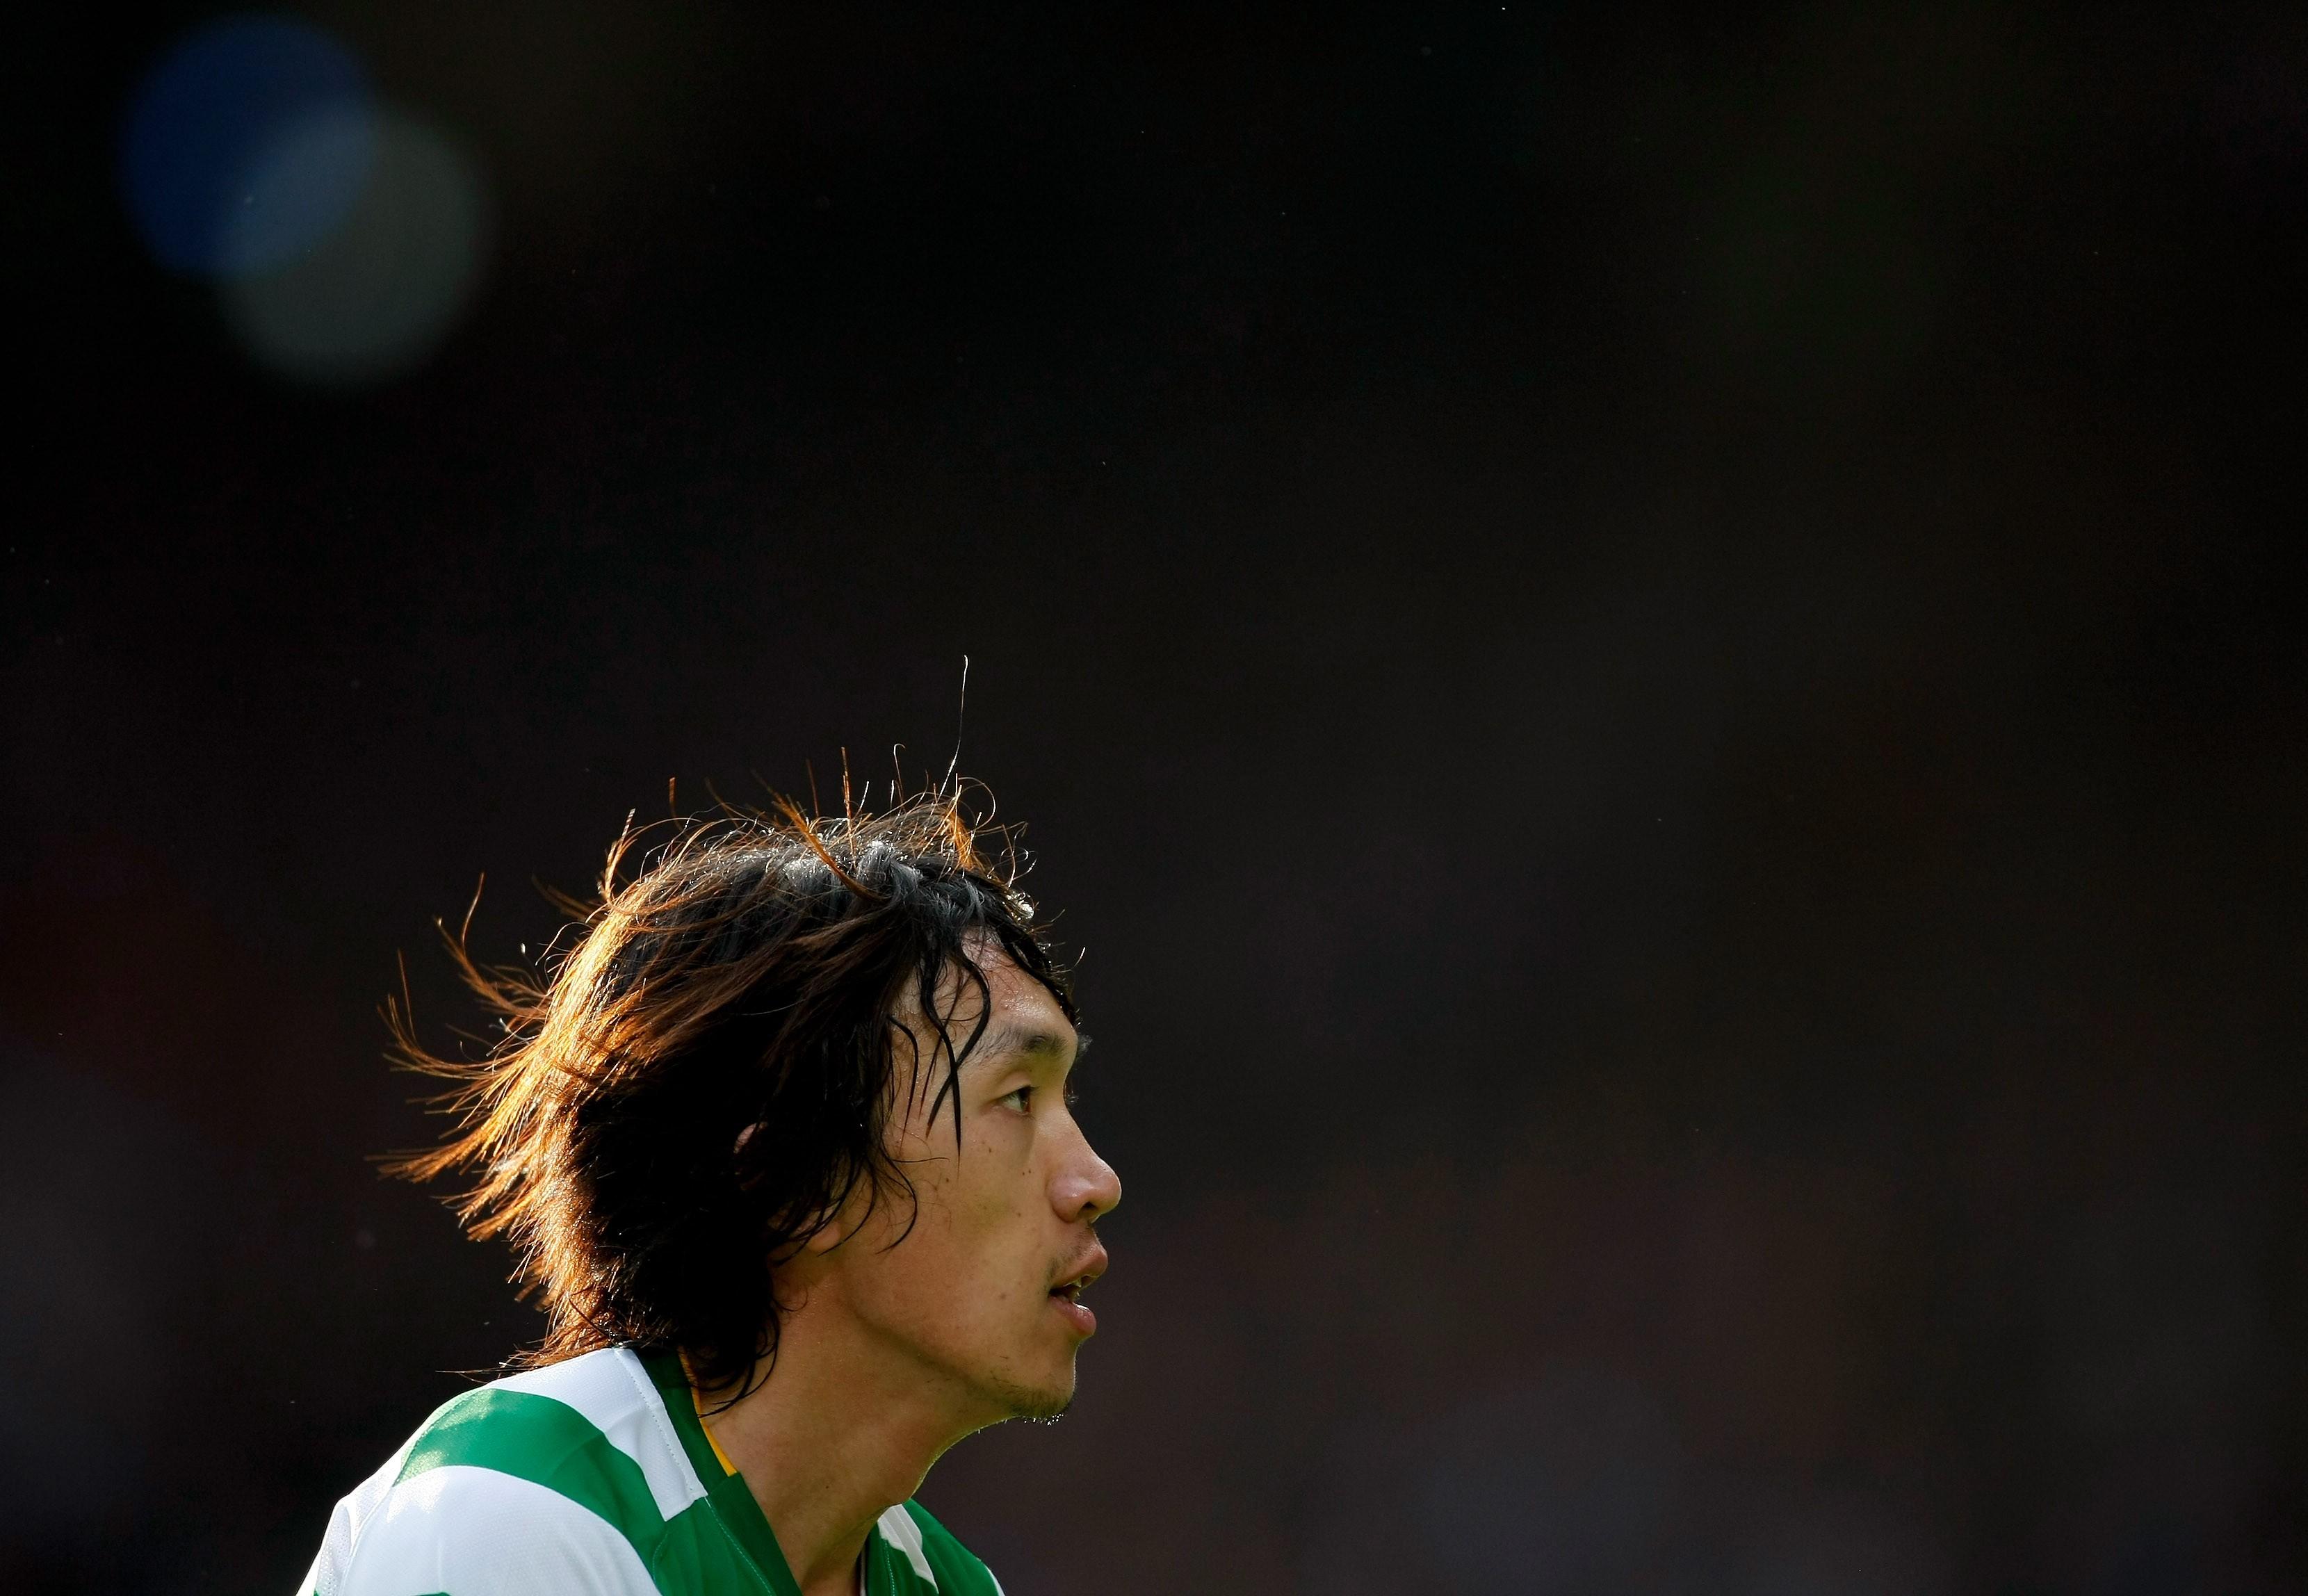 Remember when Shunsuke Nakamura was nominated for the Ballon d'Or?